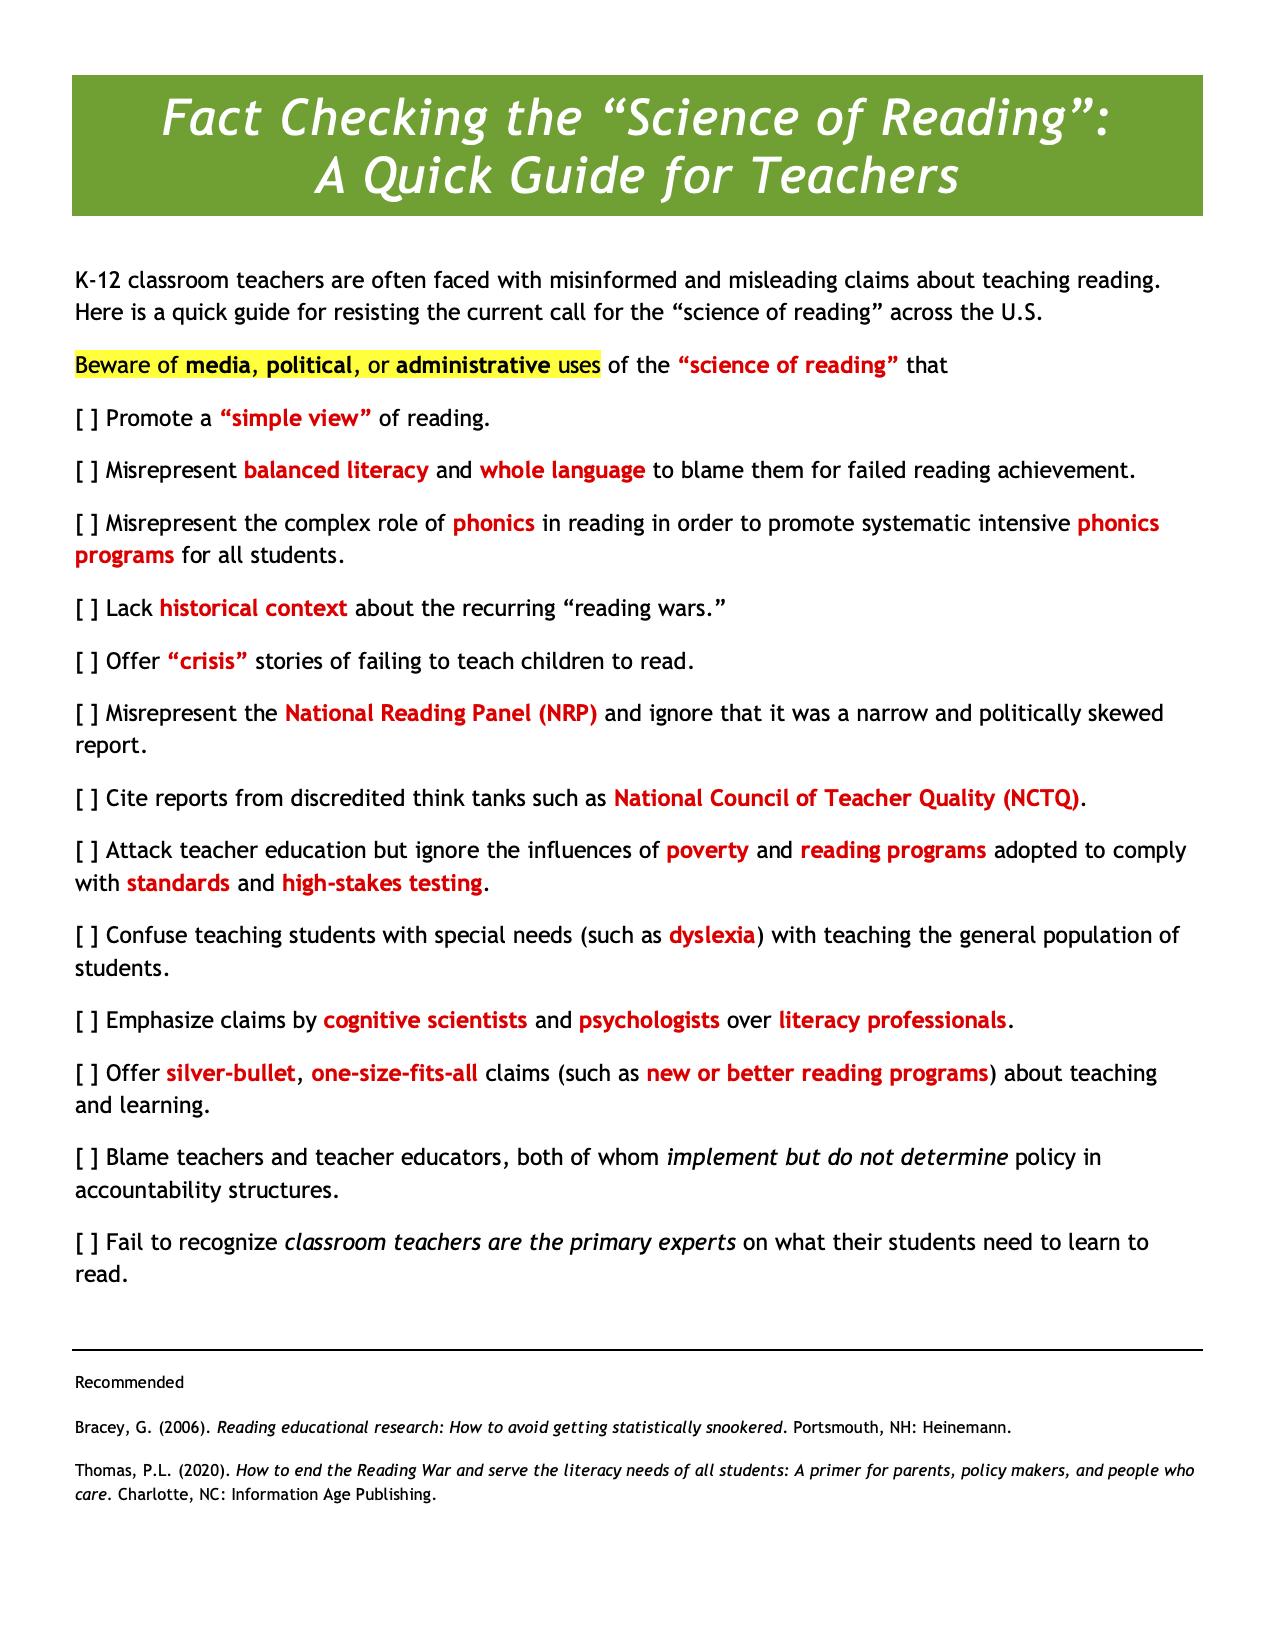 Fact Checking SoR quick guide copy